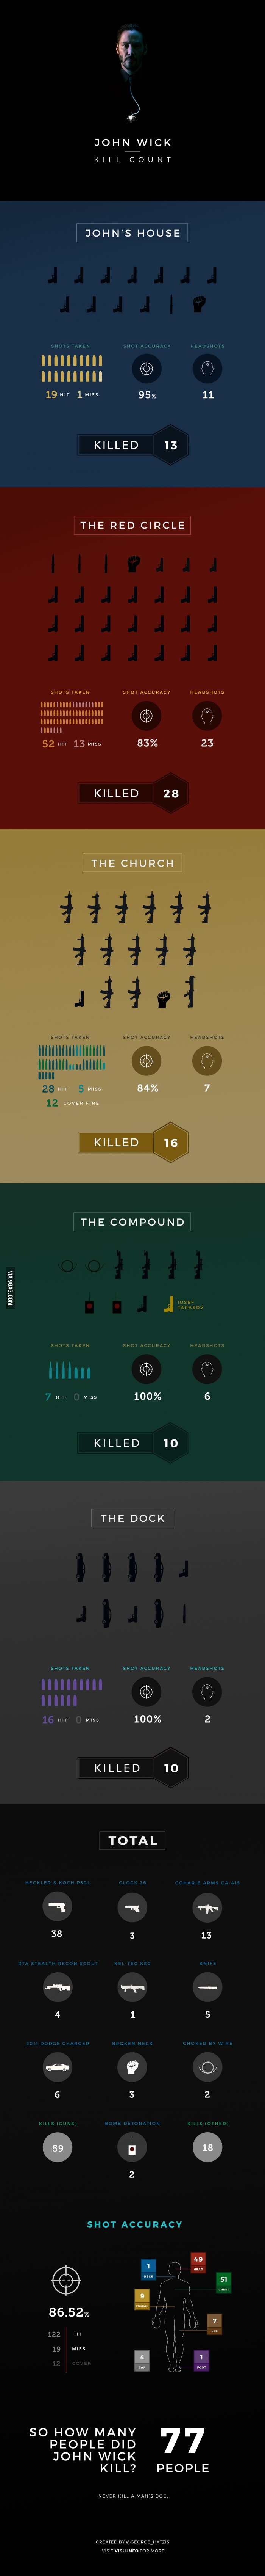 geekstra_johnwick1 infografik